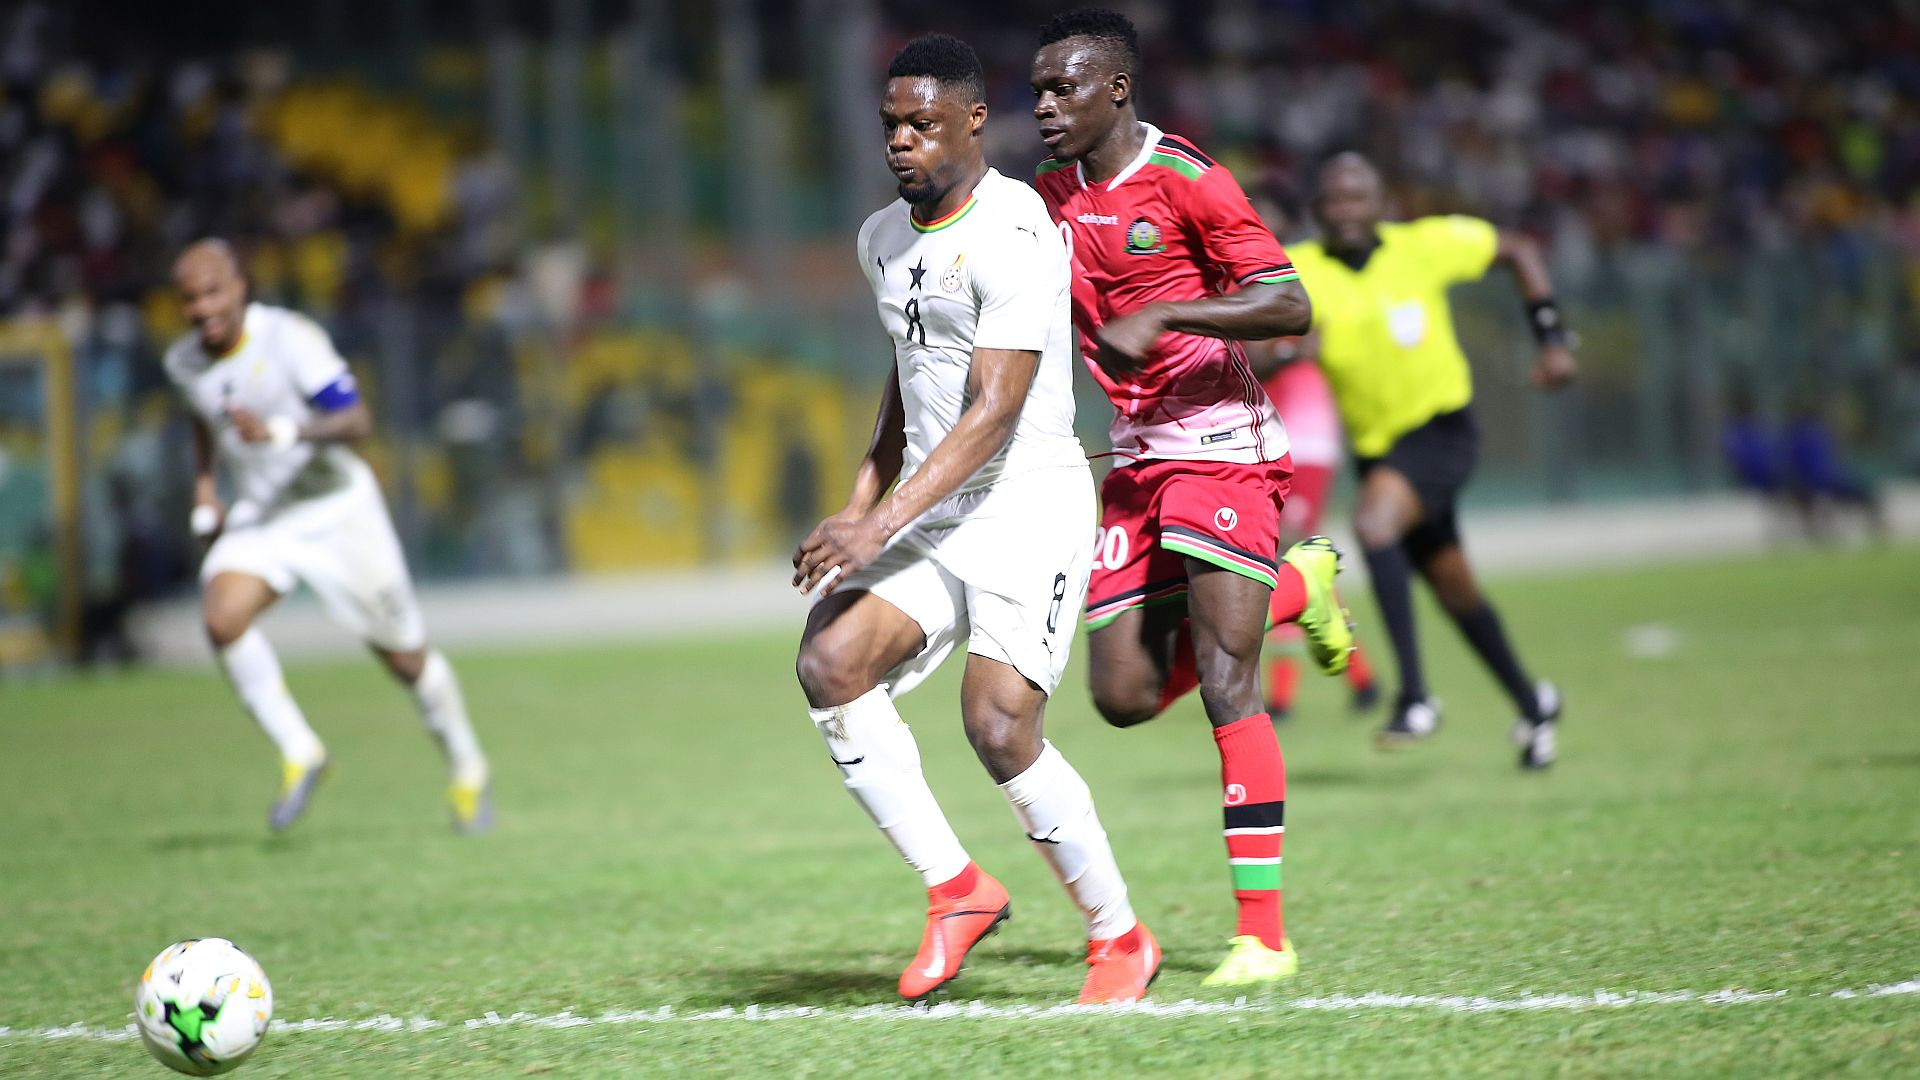 Ghana player Caleb Ekuban